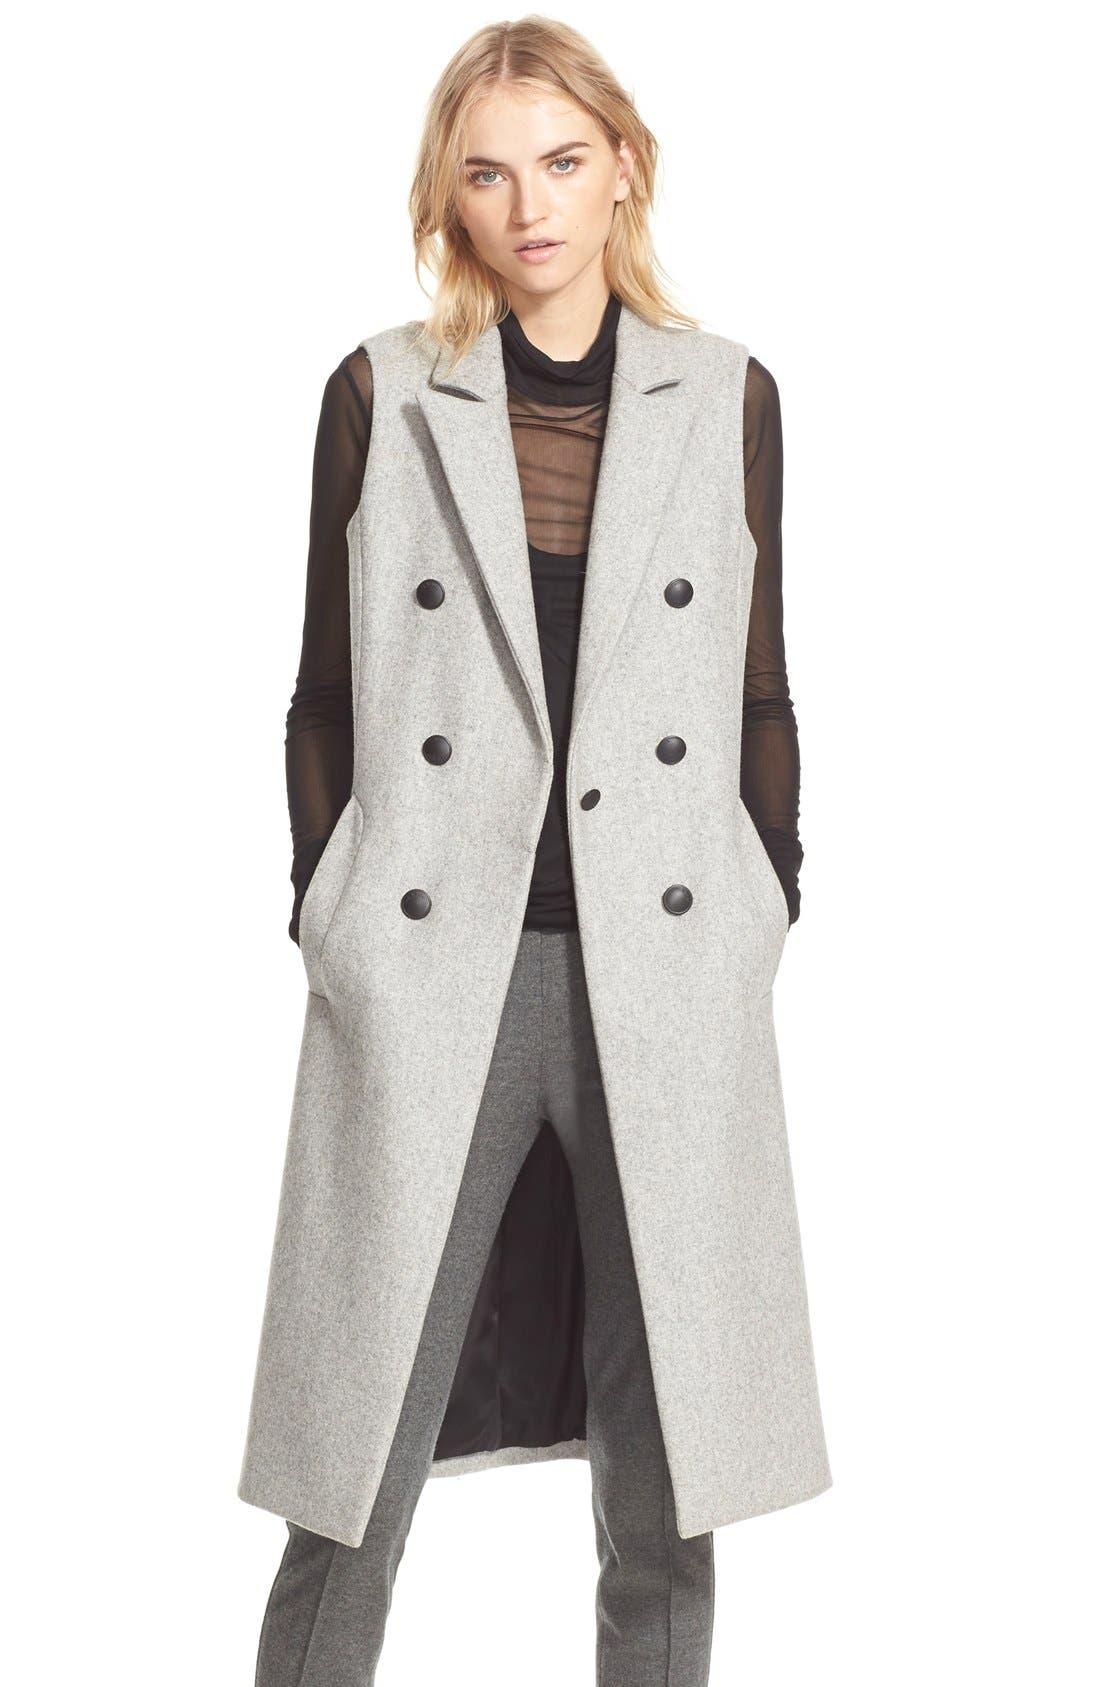 Alternate Image 1 Selected - rag & bone 'Faye' Long Double Breasted Wool Blend Vest